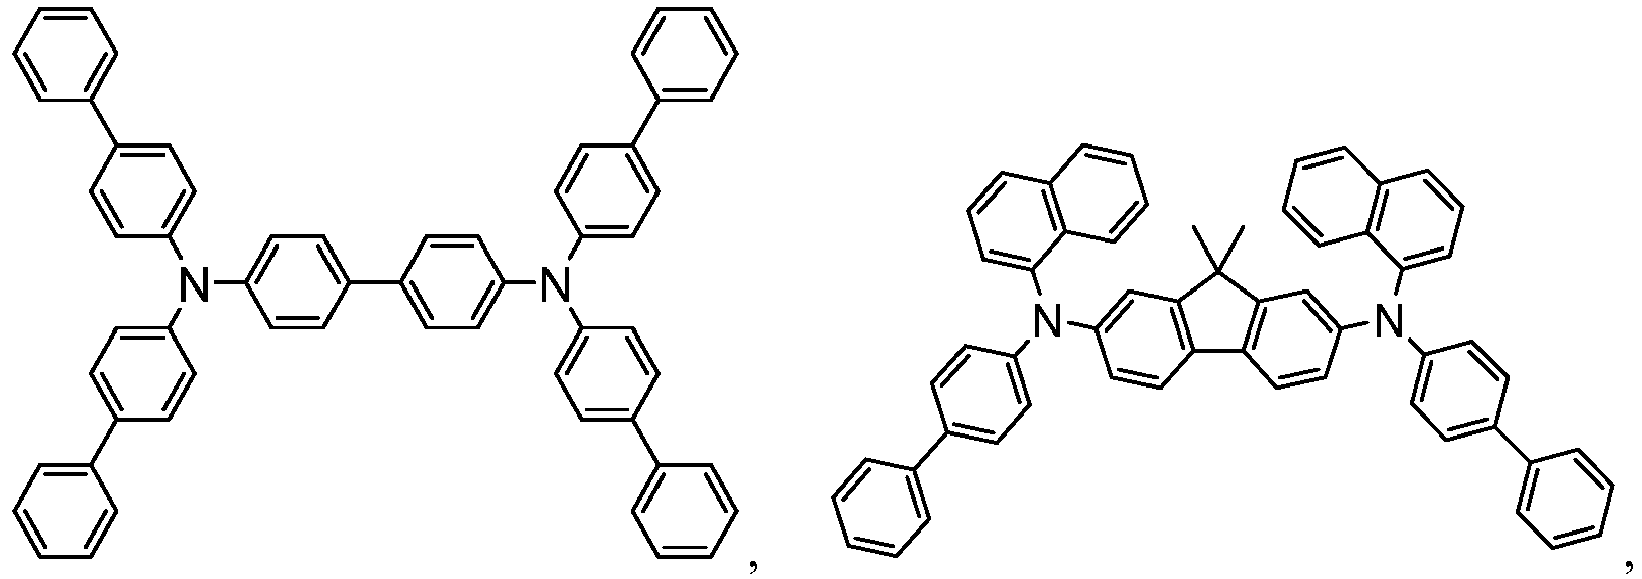 Figure imgb0869